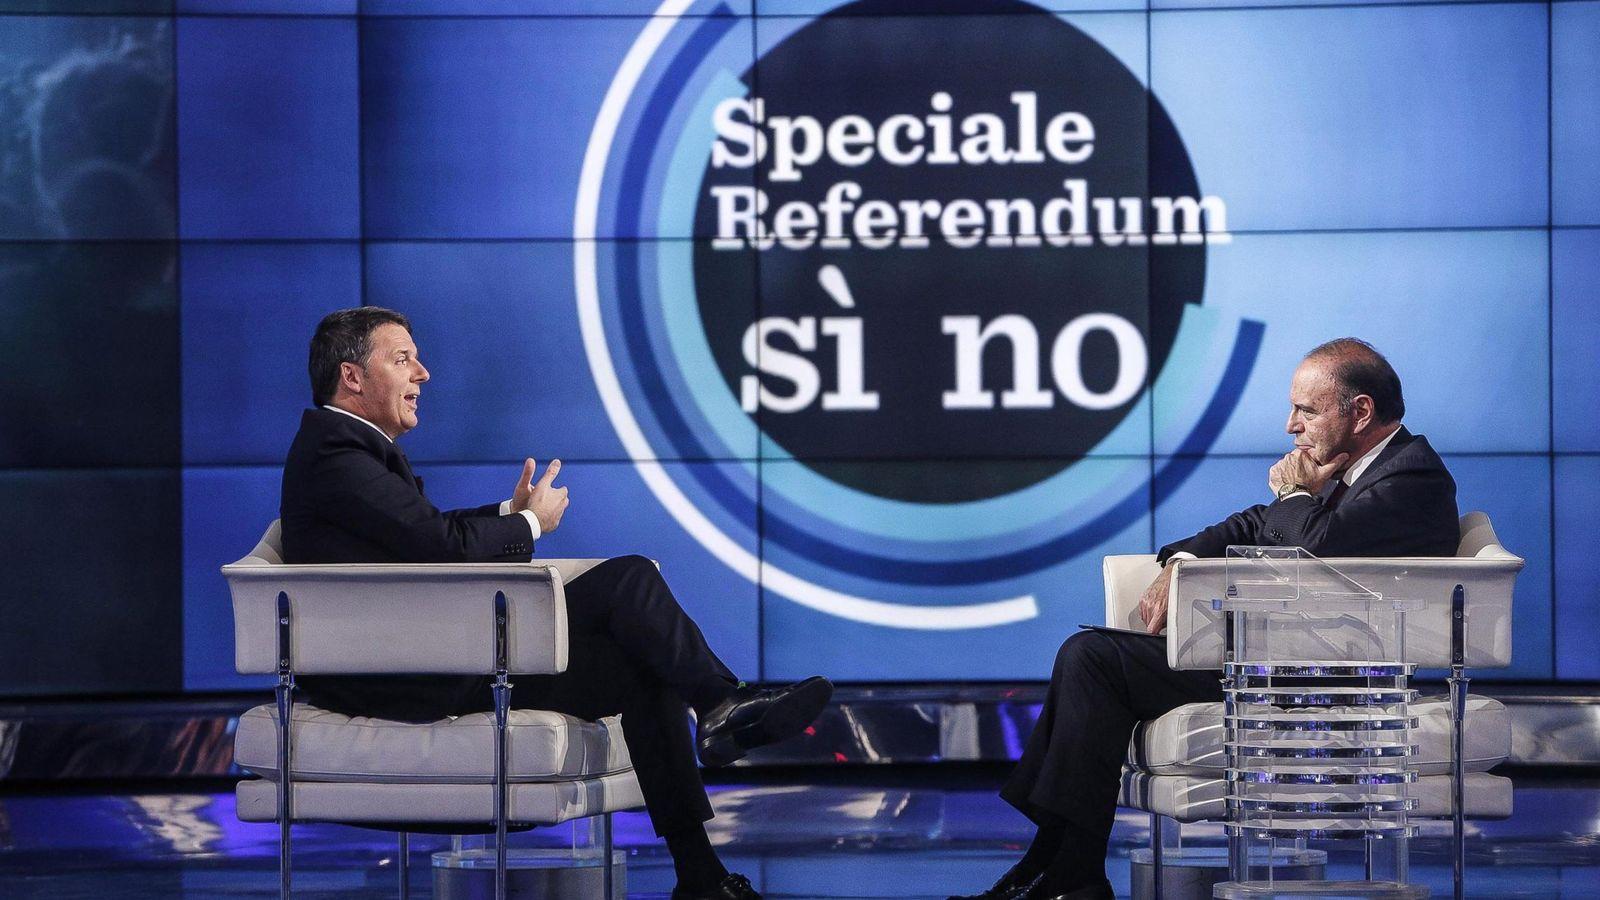 Foto: El primer ministro italiano, Matteo Renzi, a la izquierda. (EFE)